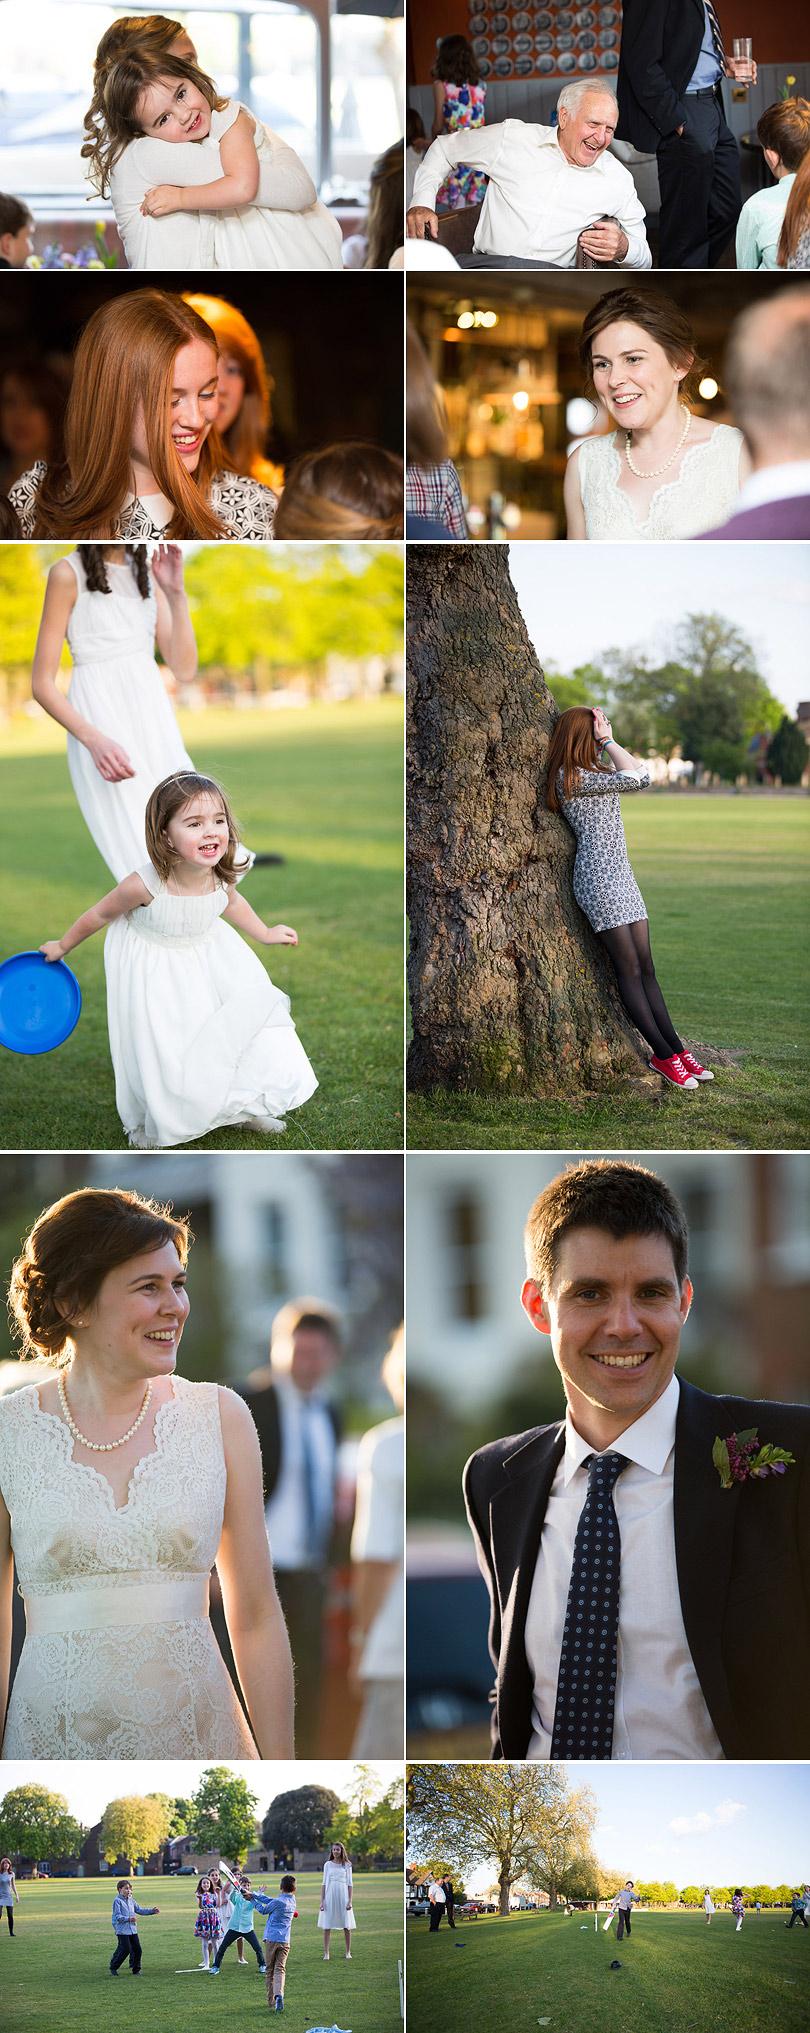 Rachel&Sam-Ealing-Wedding_25.jpg